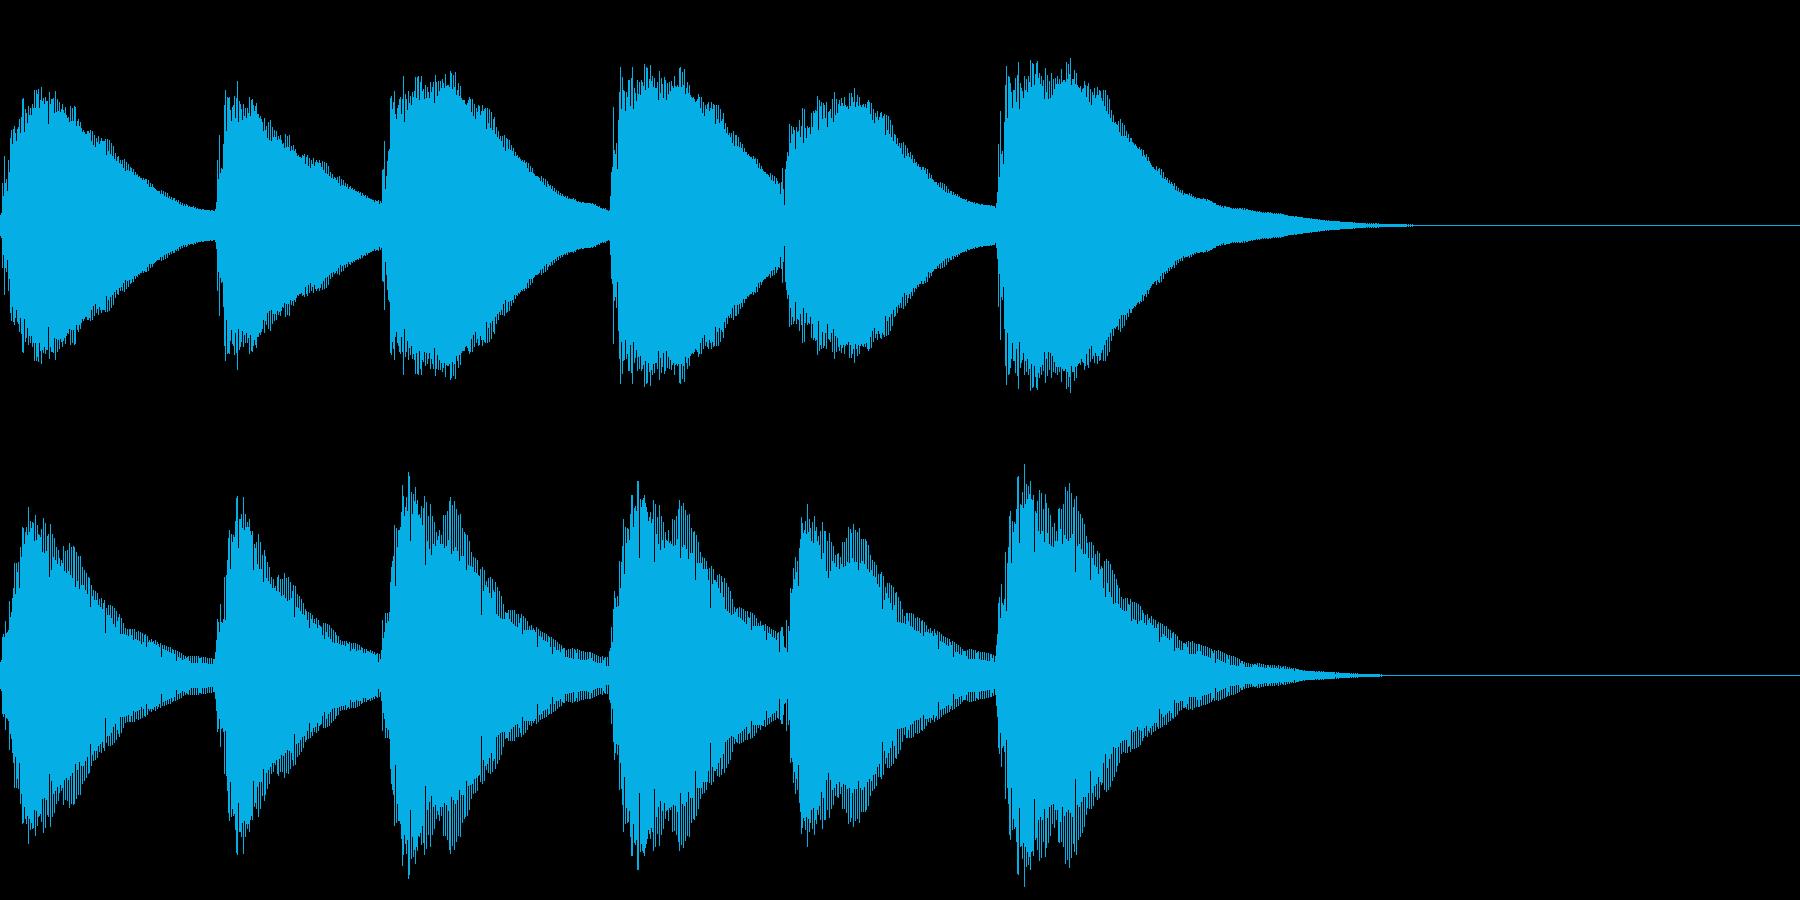 FX・SE/ピアノ/コール/アラームの再生済みの波形